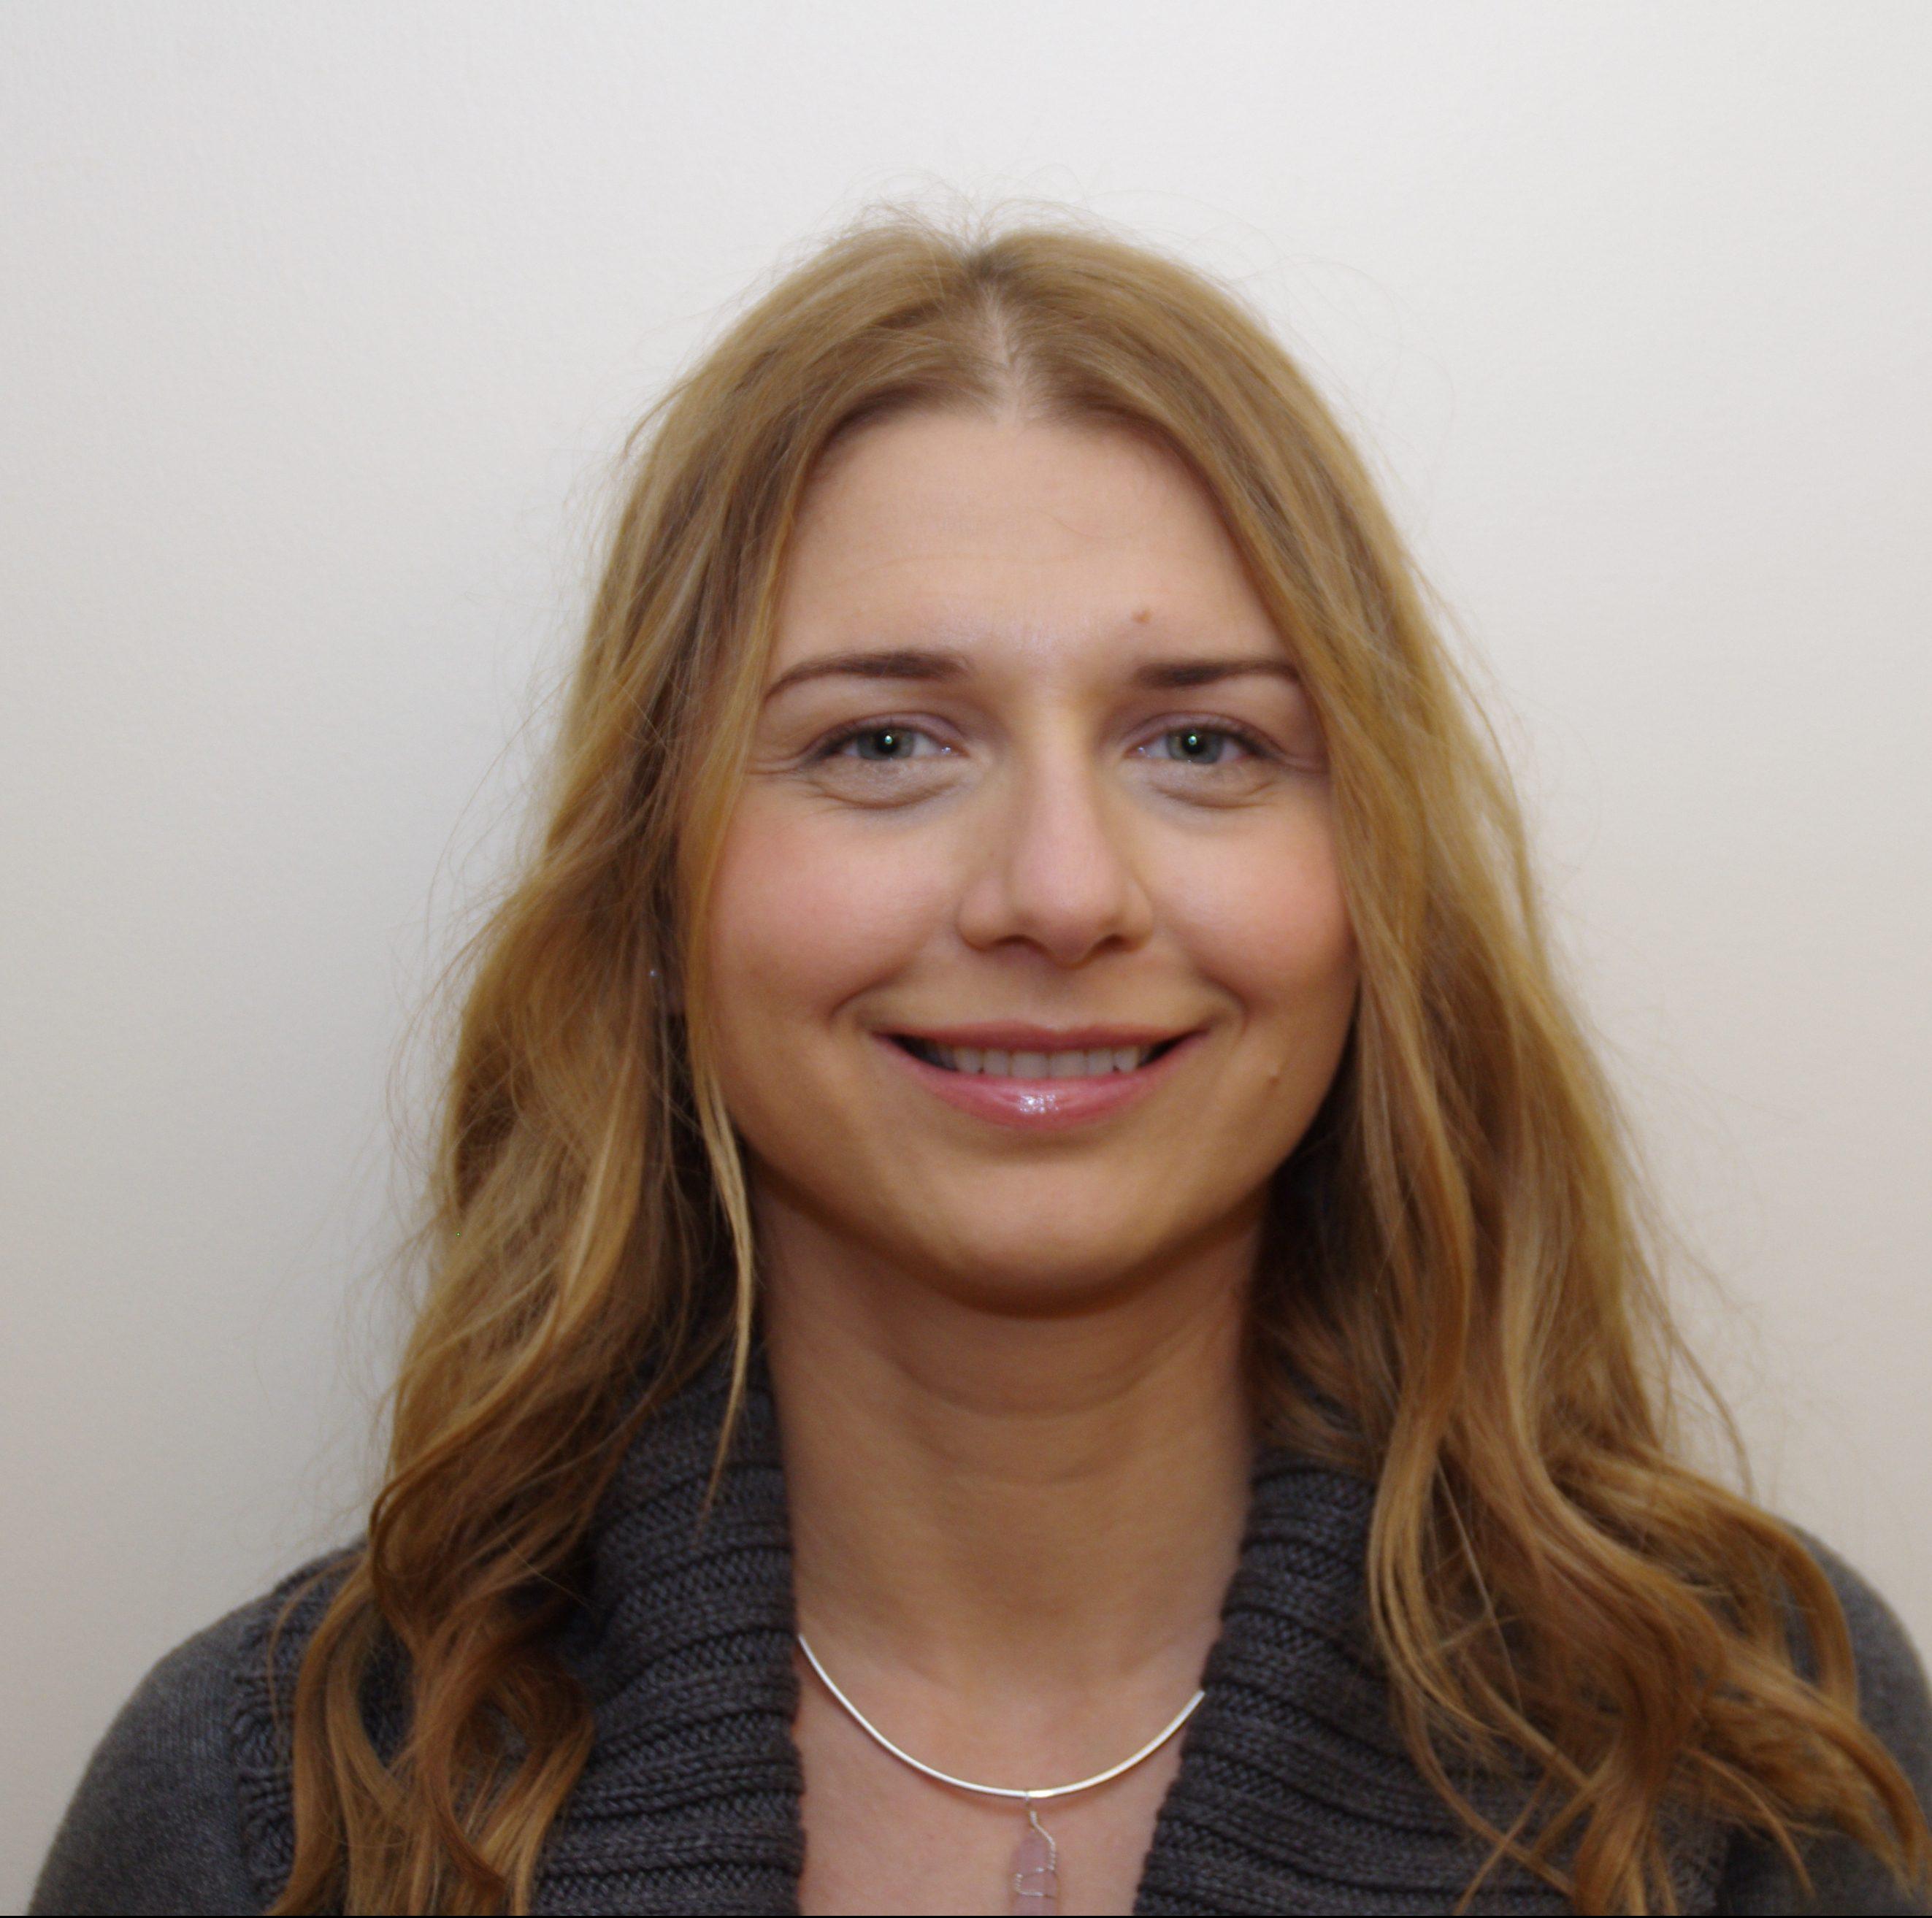 Psychologist Monica Lazarescu